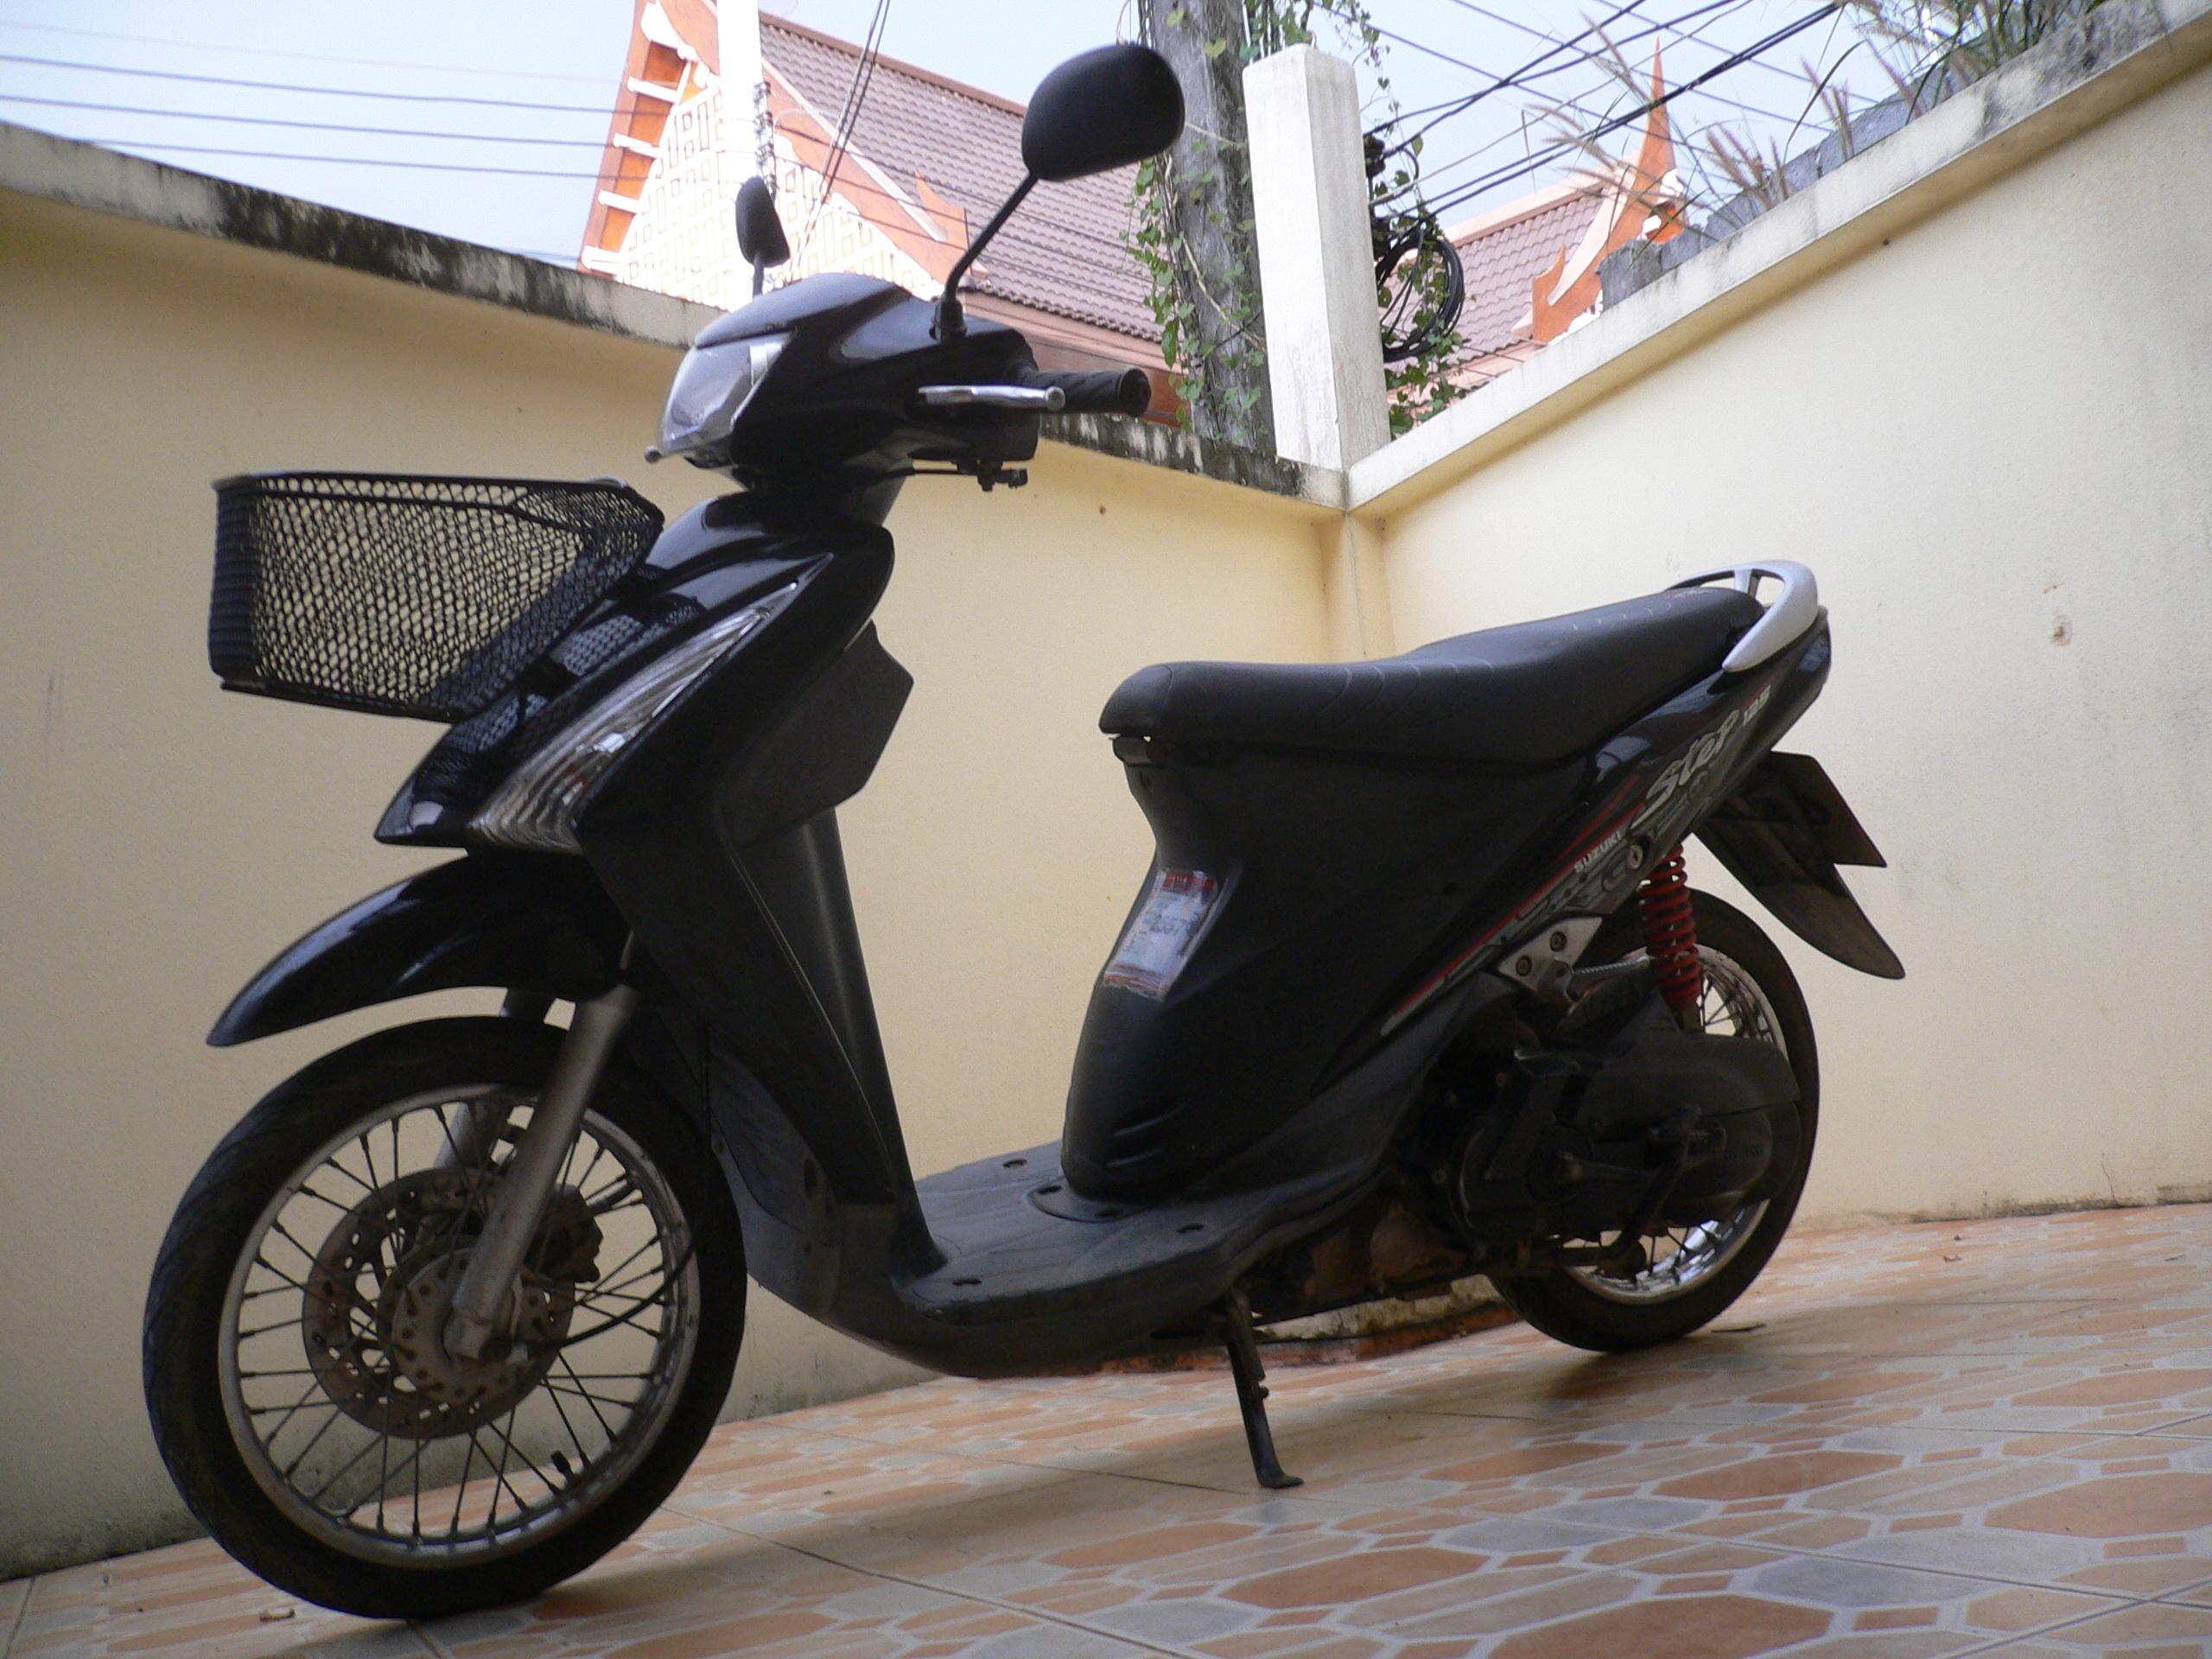 Продам мотобайк Suzuki Step 125cc за 14990 бат